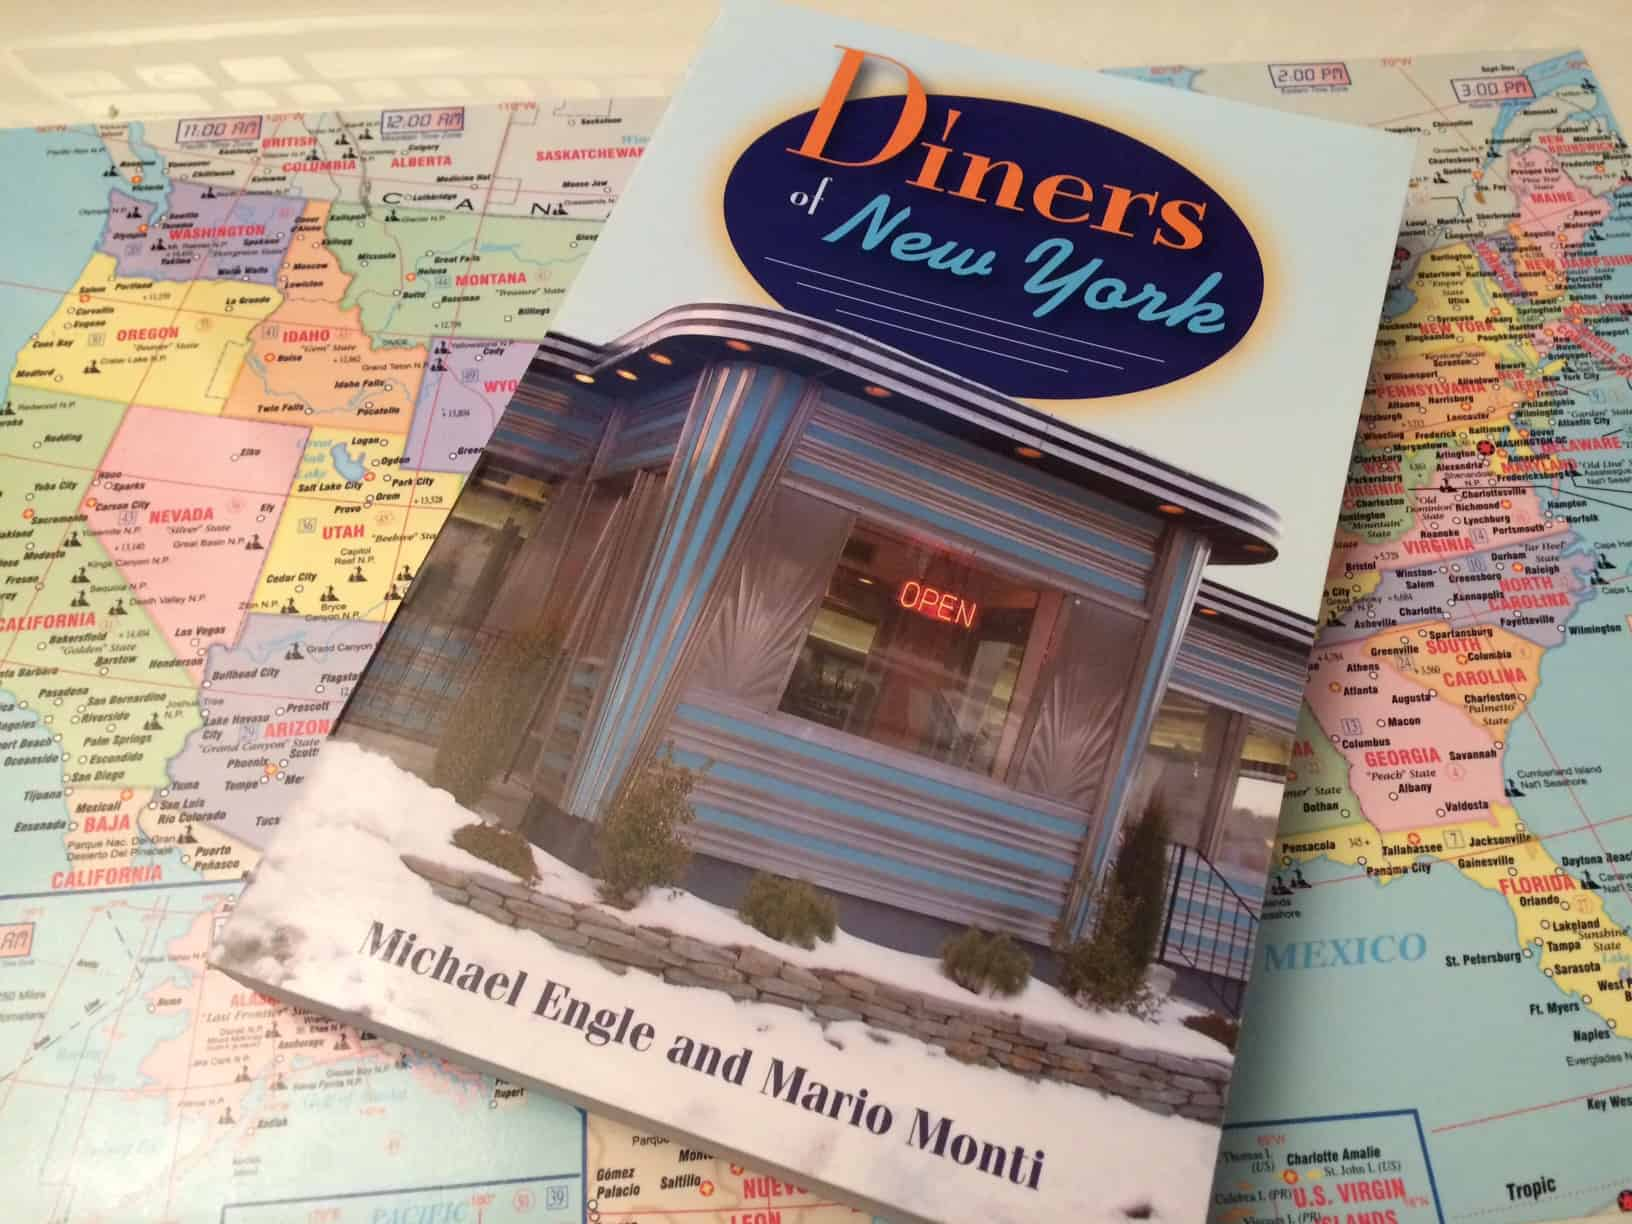 Diners of New York Book - Elizaville Diner Exterior - Retro Roadmap